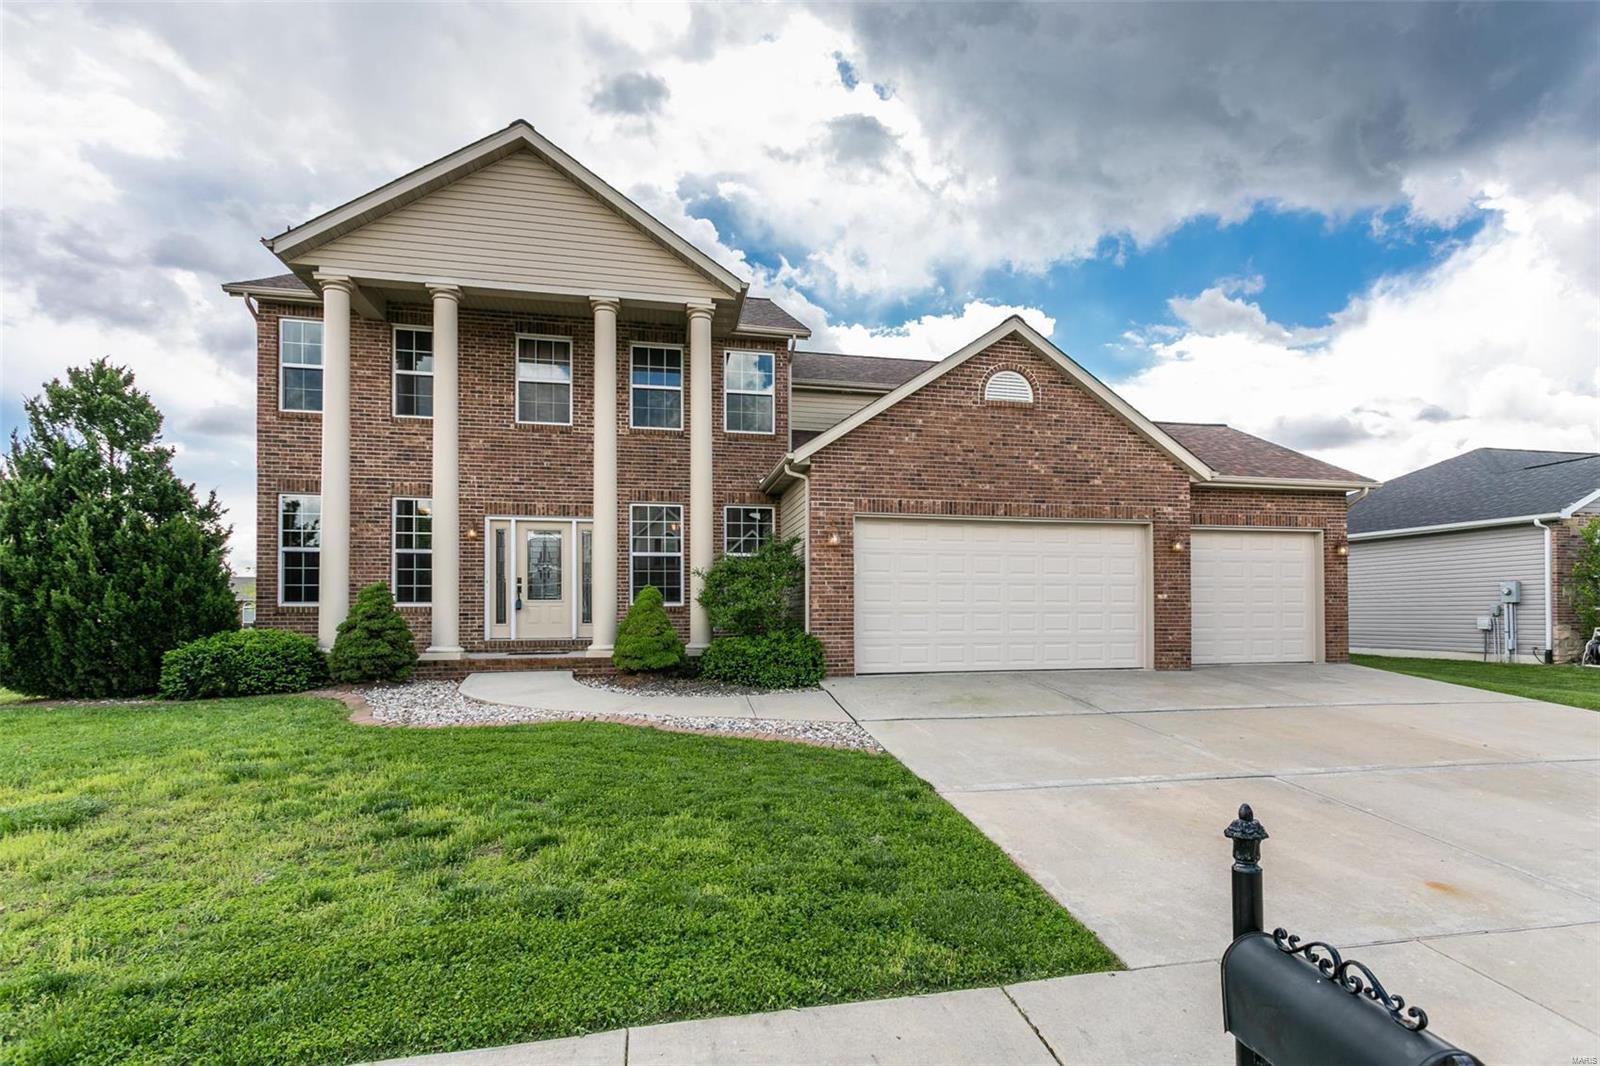 416 Chadwyck Drive Property Photo - Glen Carbon, IL real estate listing